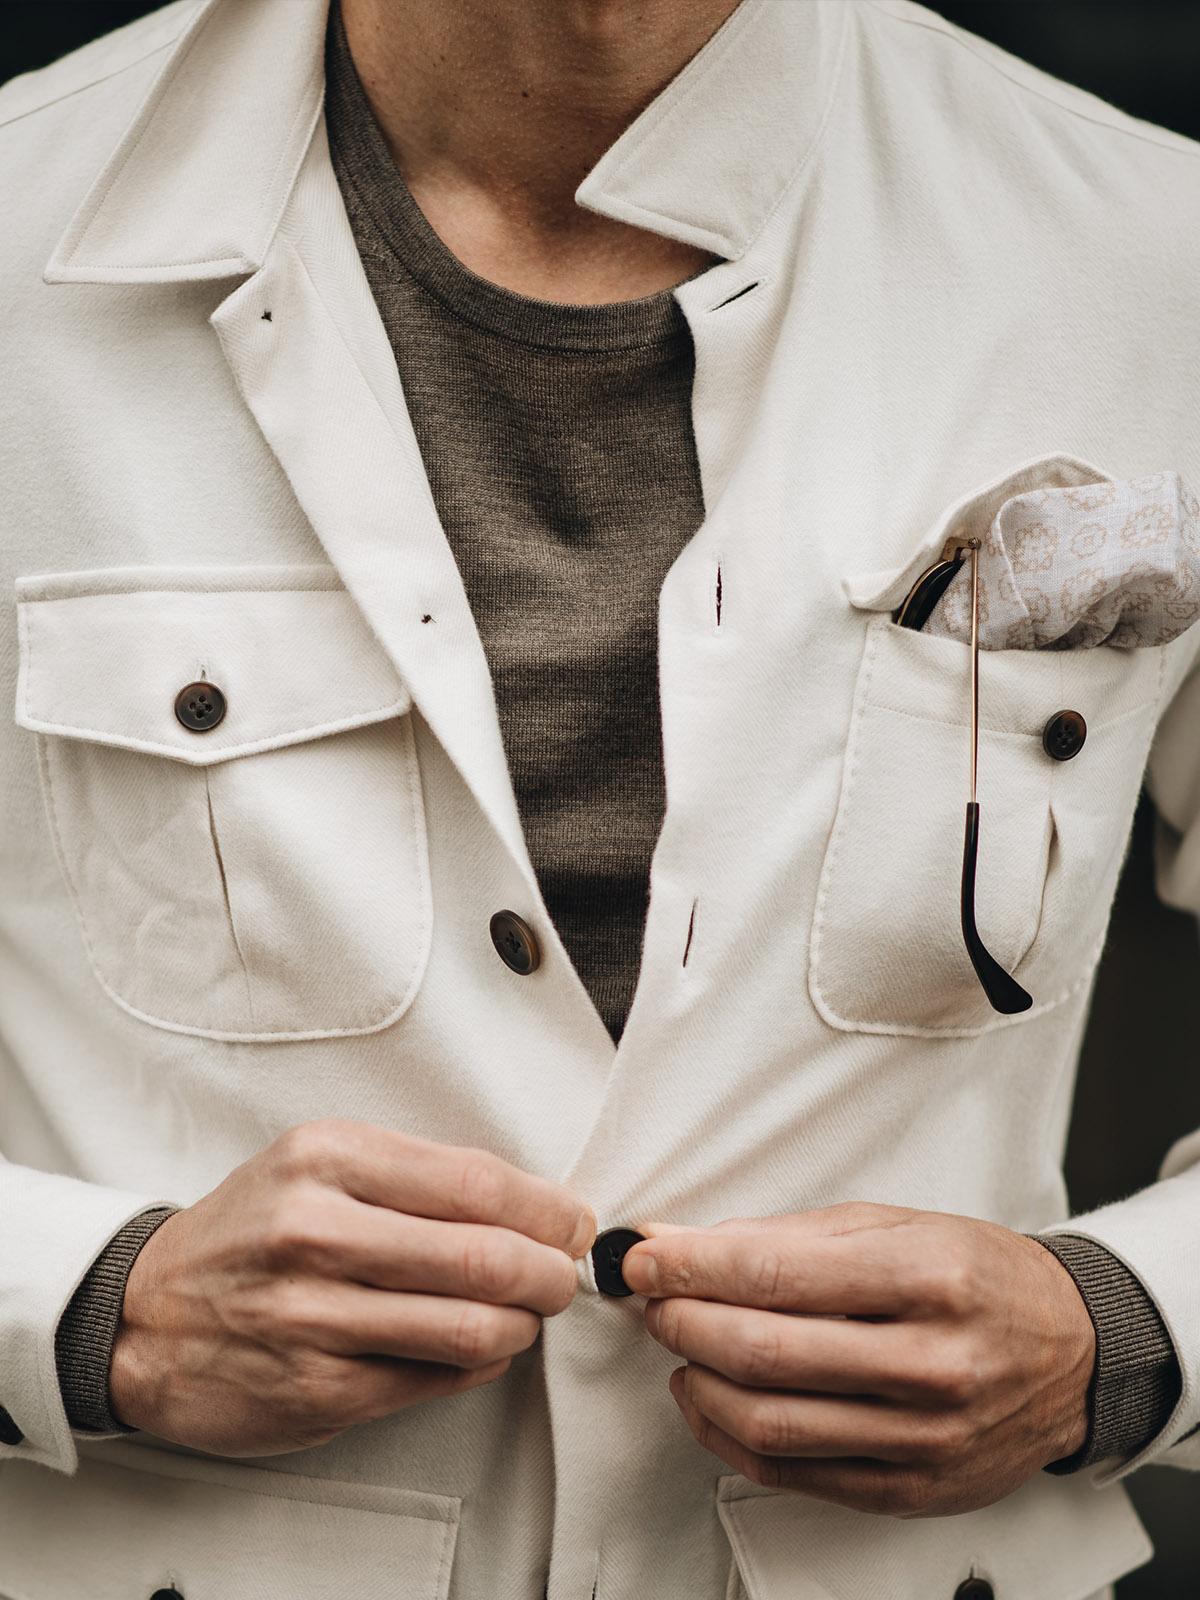 overshirt details donkere knopen